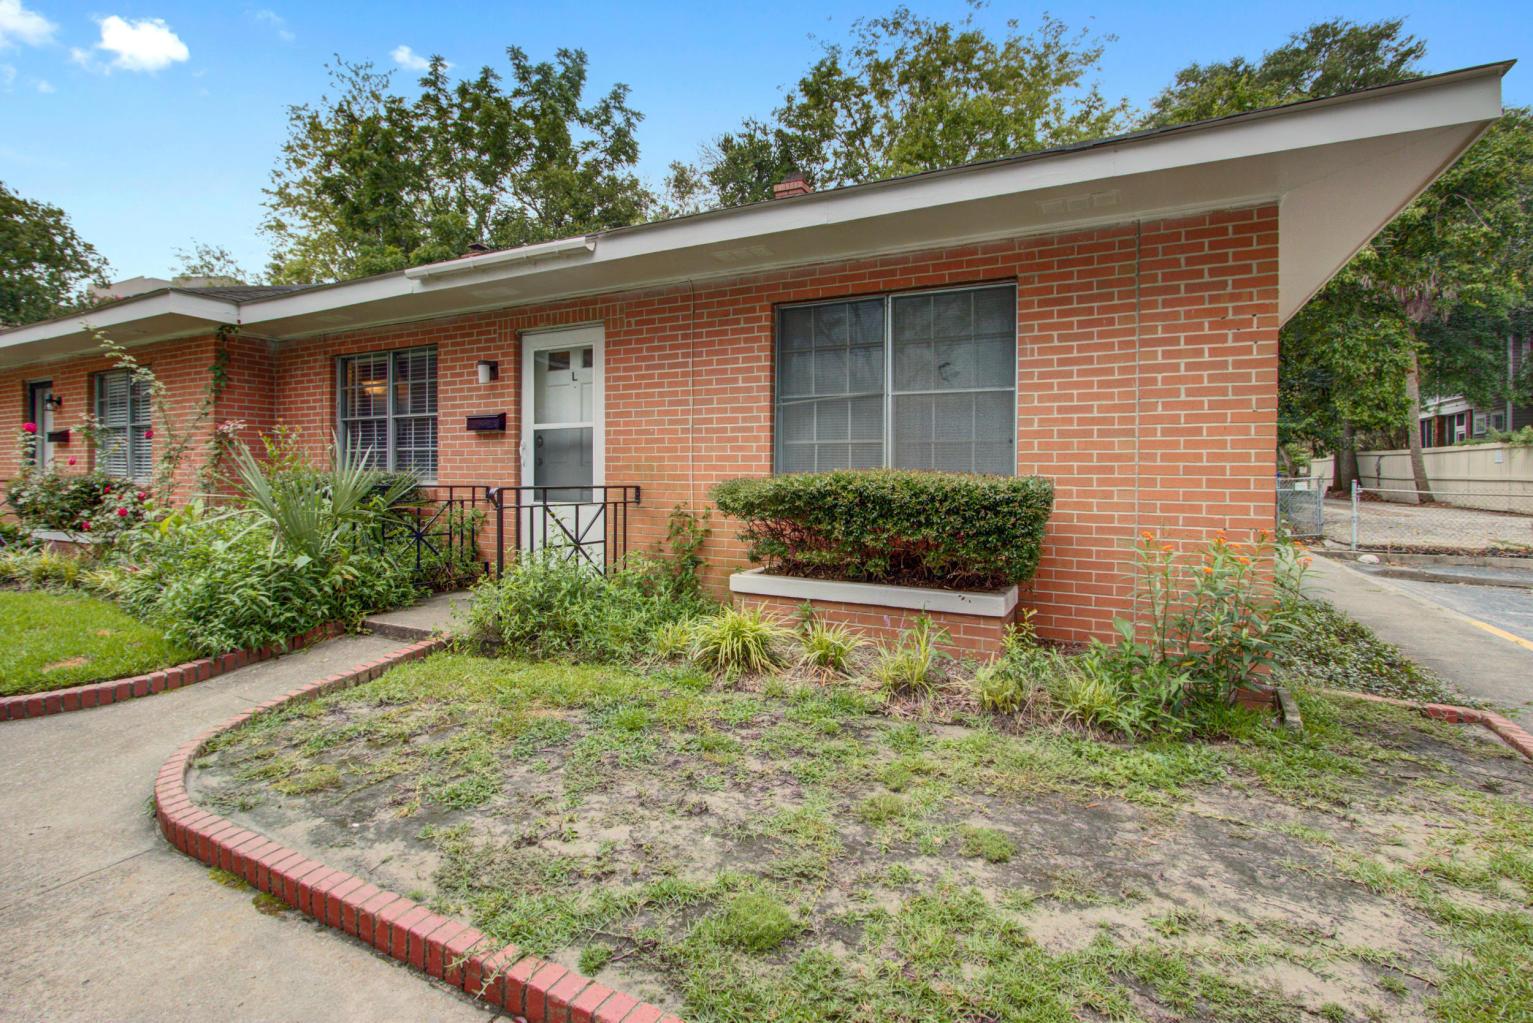 Rutledge Green Homes For Sale - 173 Rutledge, Charleston, SC - 9